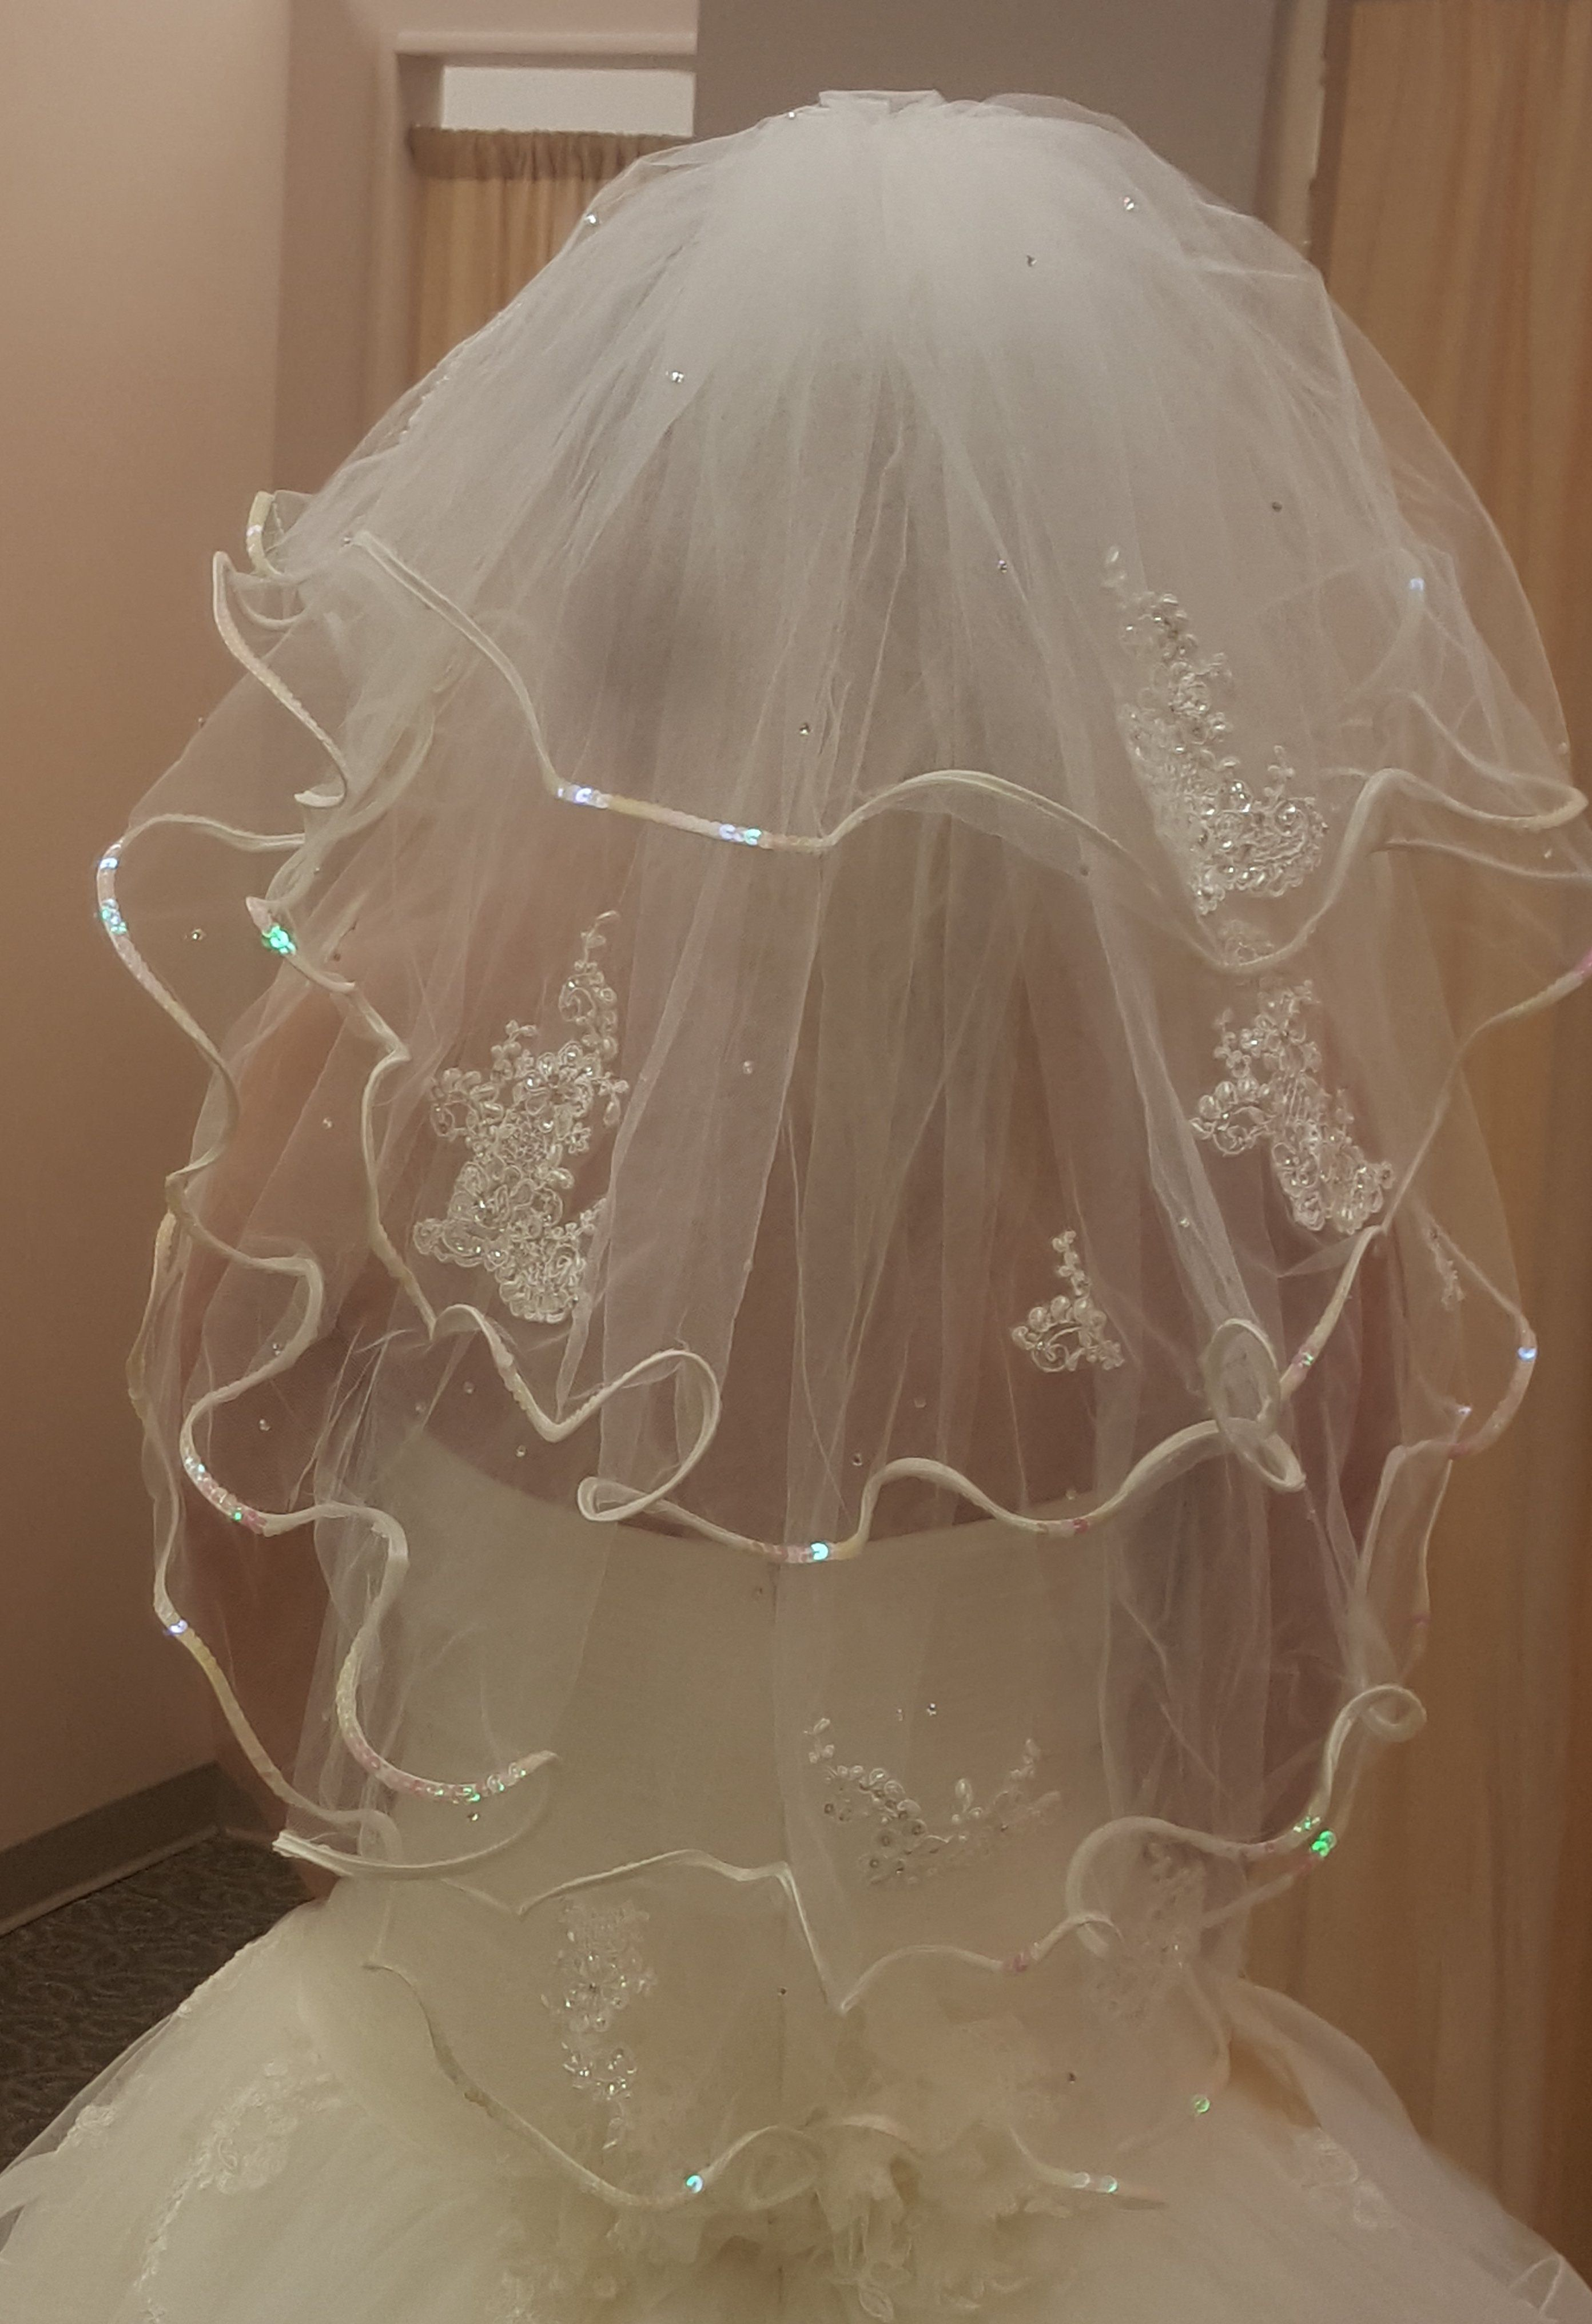 Diy Wedding Veil.Diy Wedding Veil Trim And Beading Less Than 25 Total You Can Buy